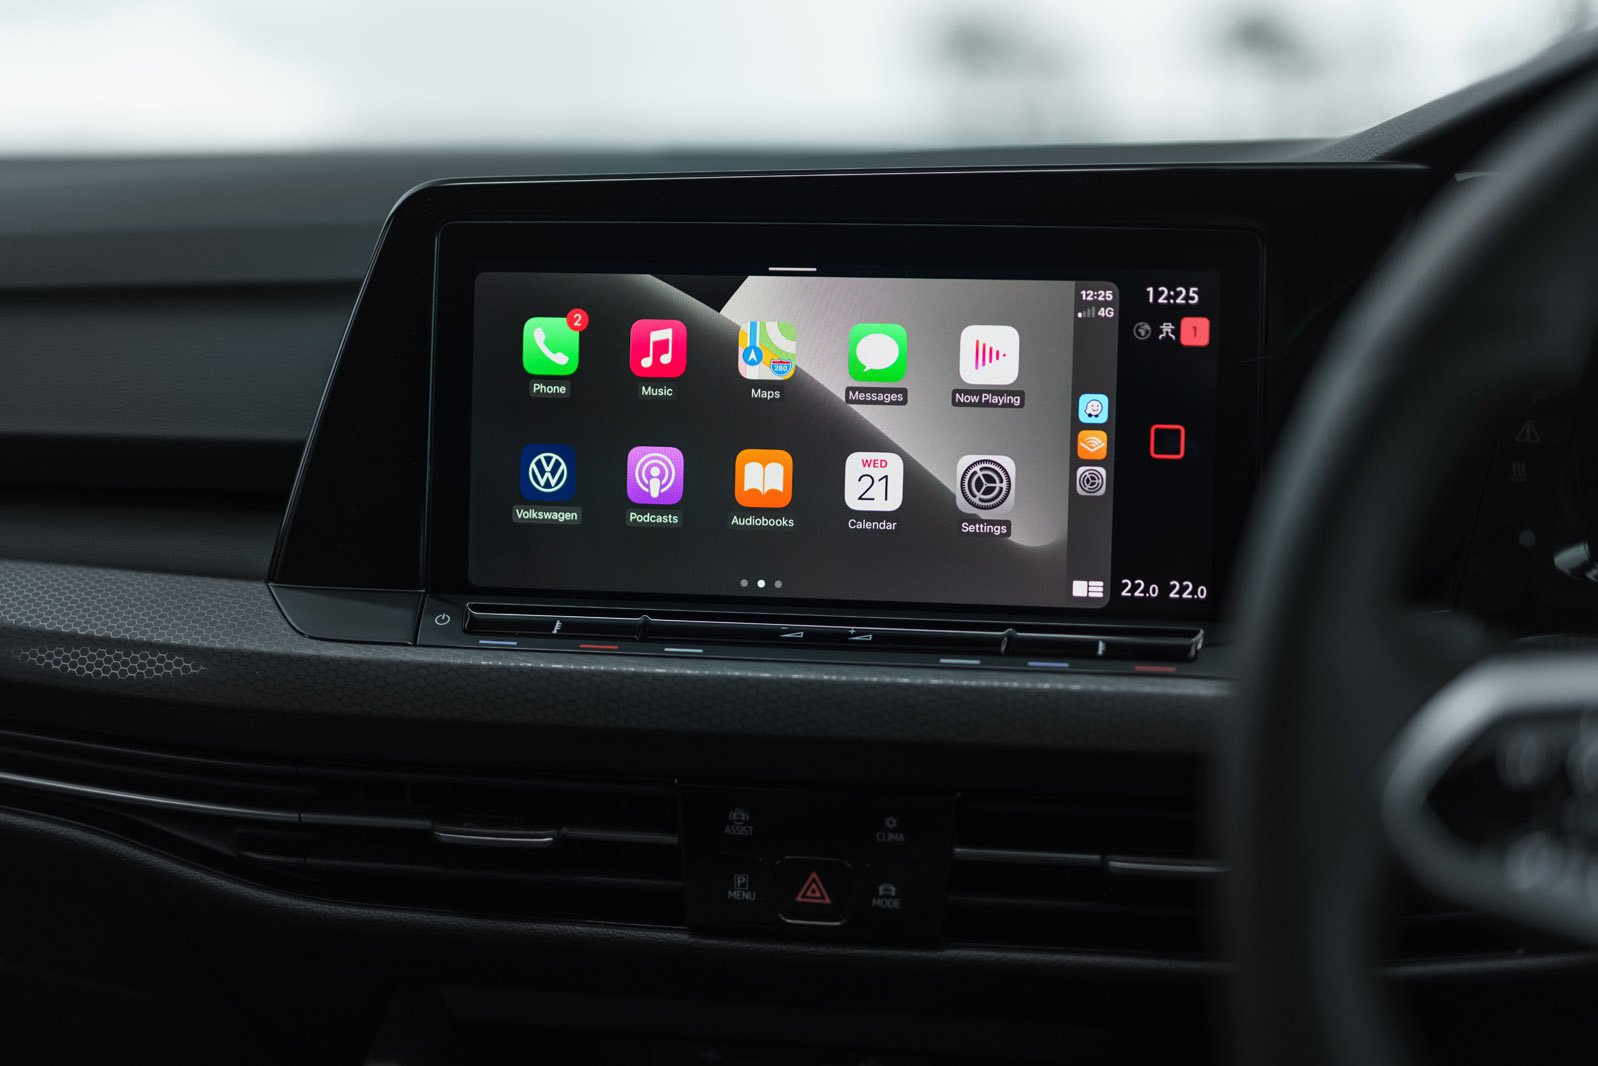 Volkswagen Golf GTI 2021 Infotainment screen